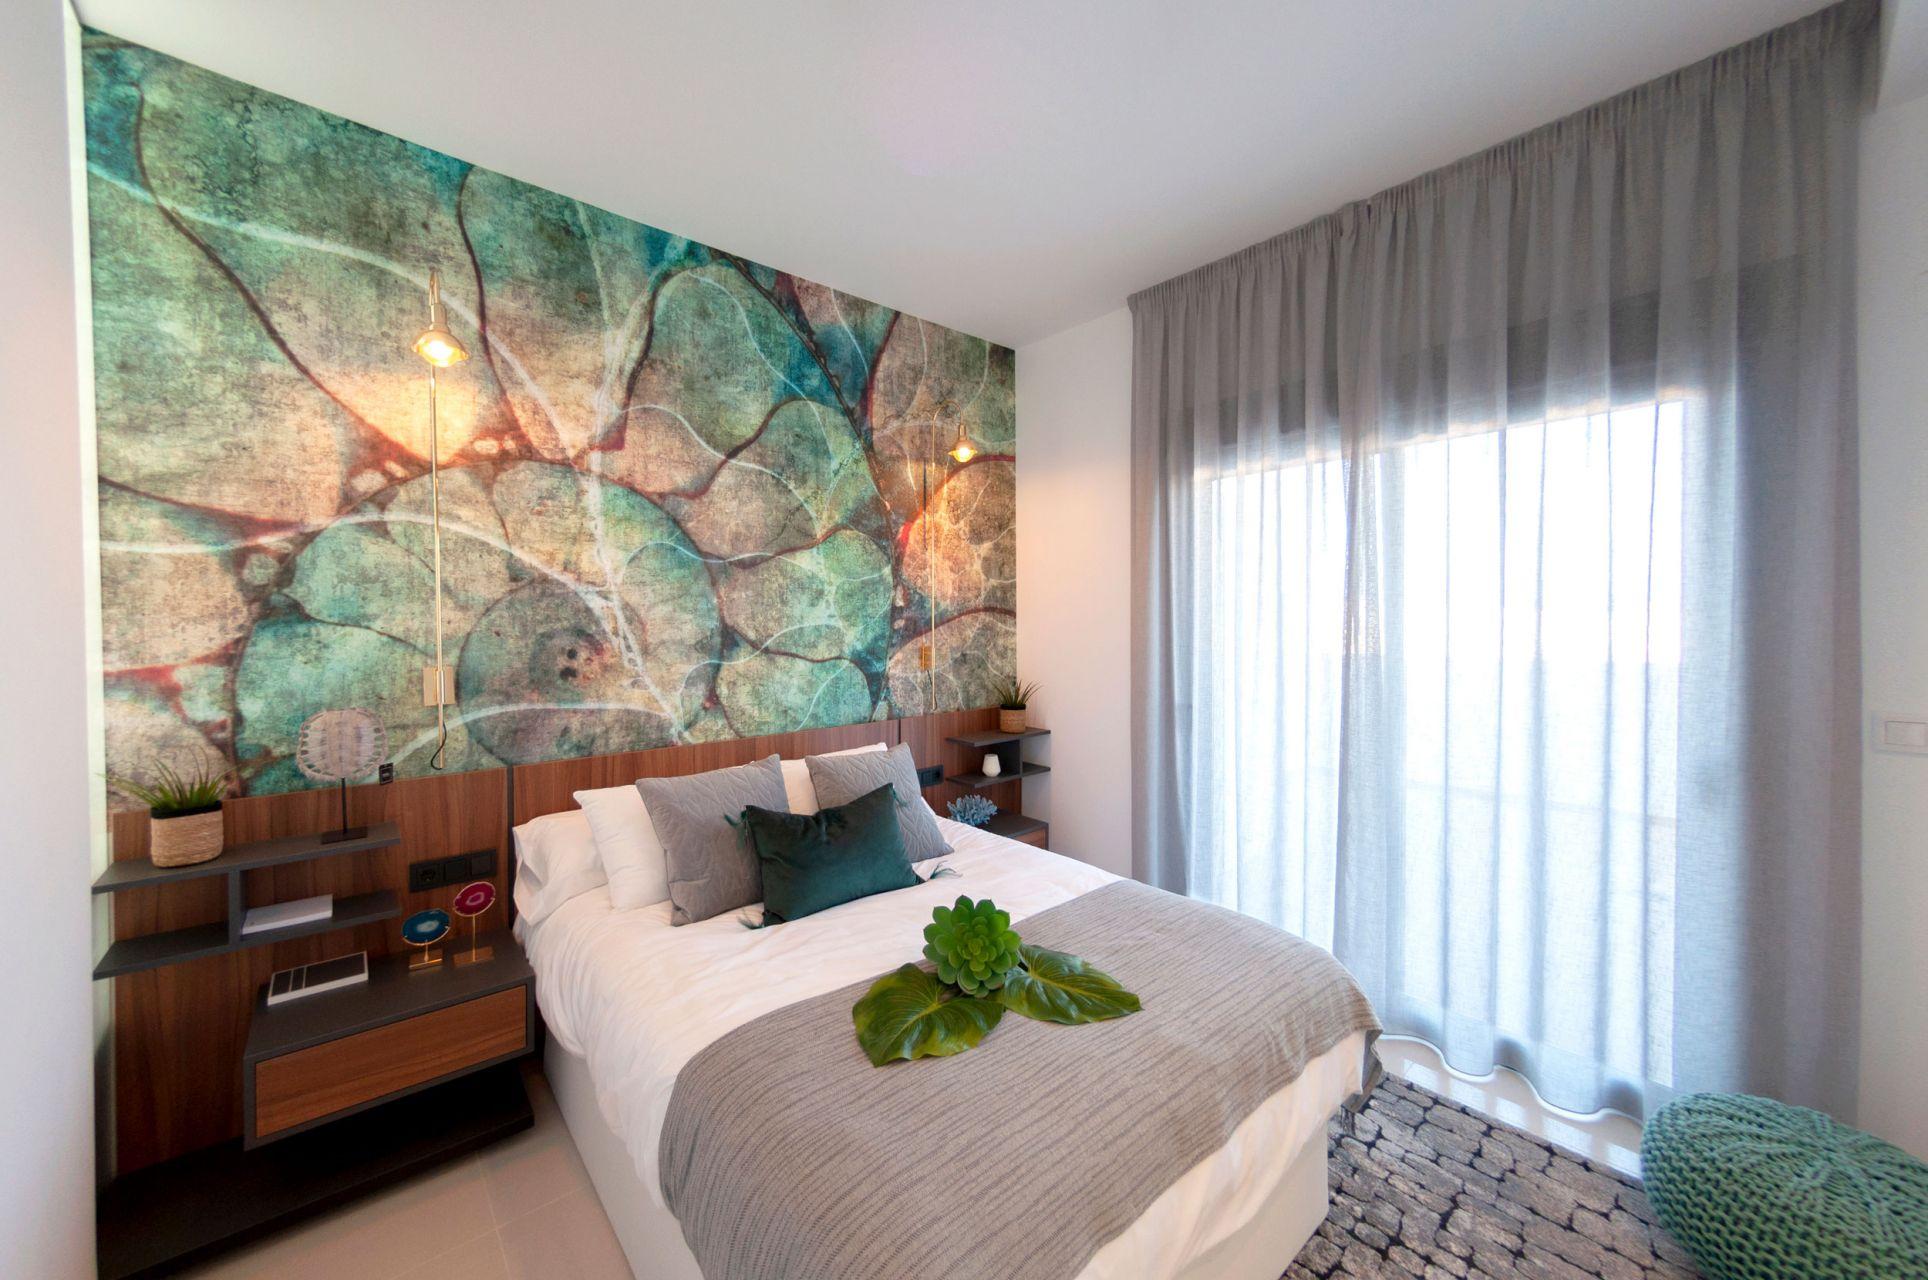 Apartments in Arenales del Sol 9